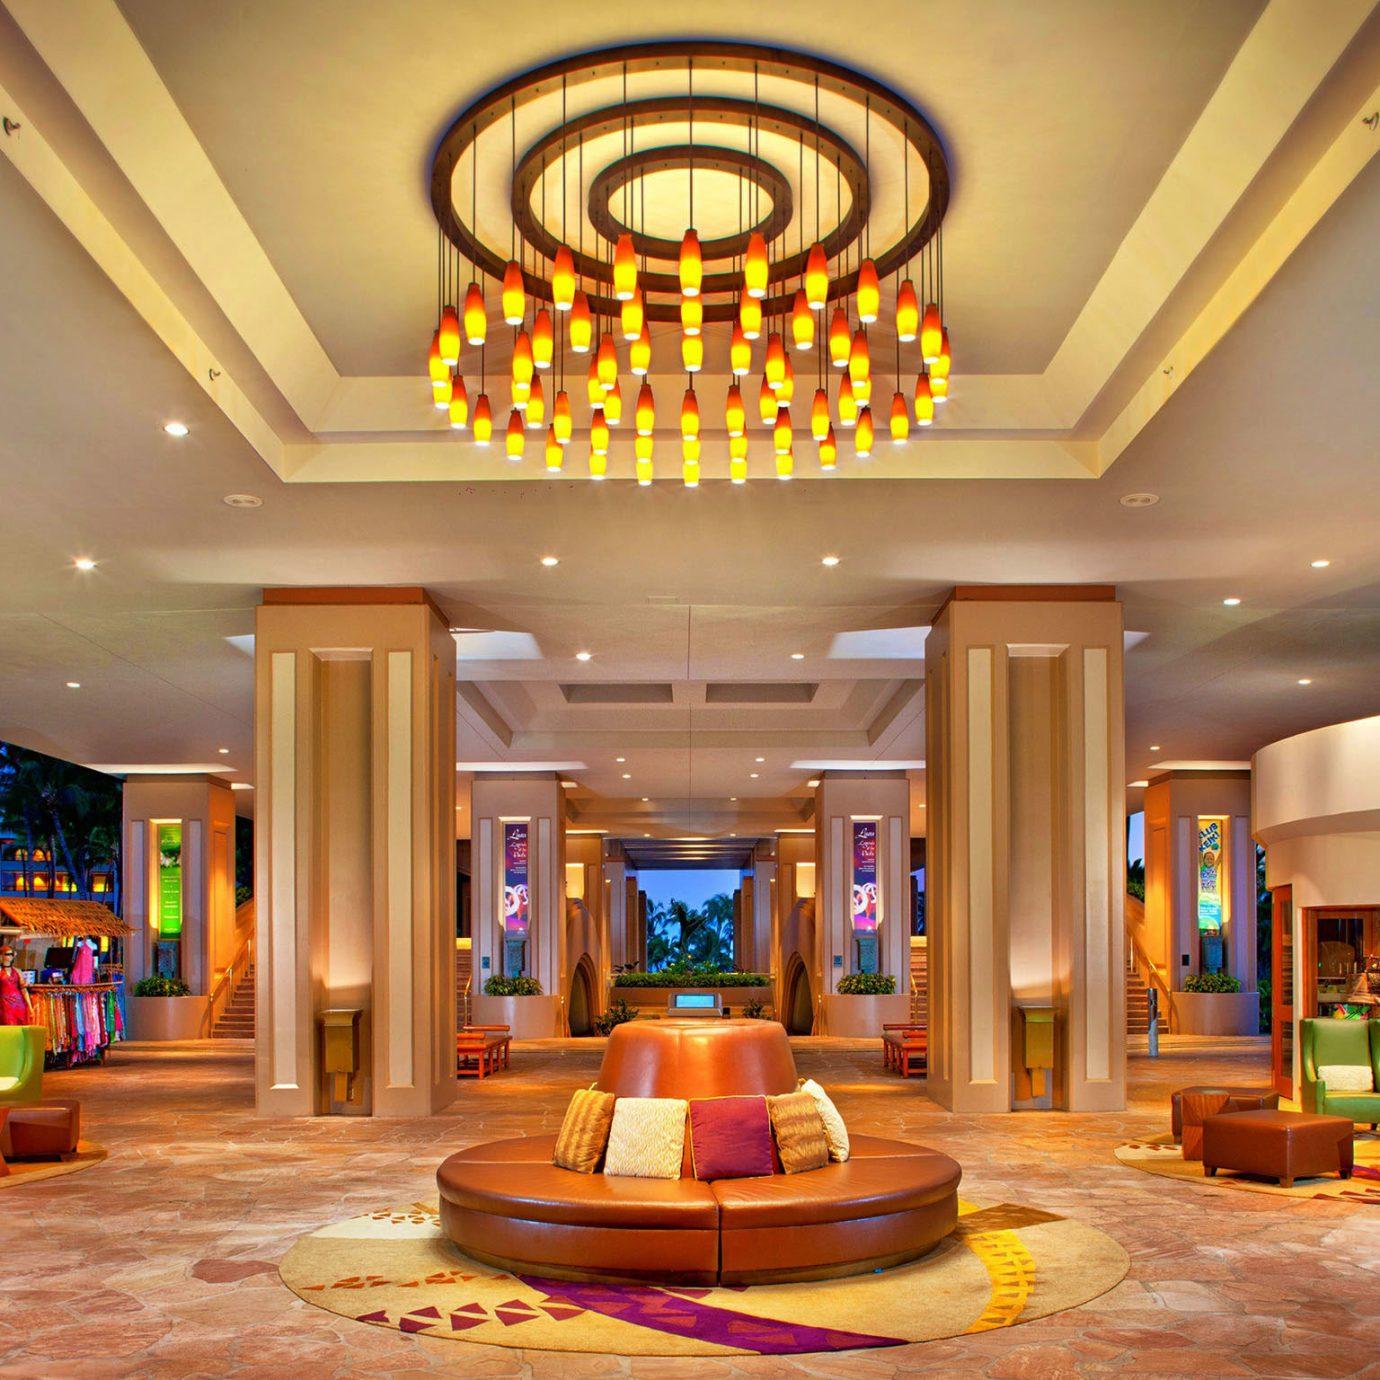 Lobby home function hall living room mansion ballroom recreation room Resort